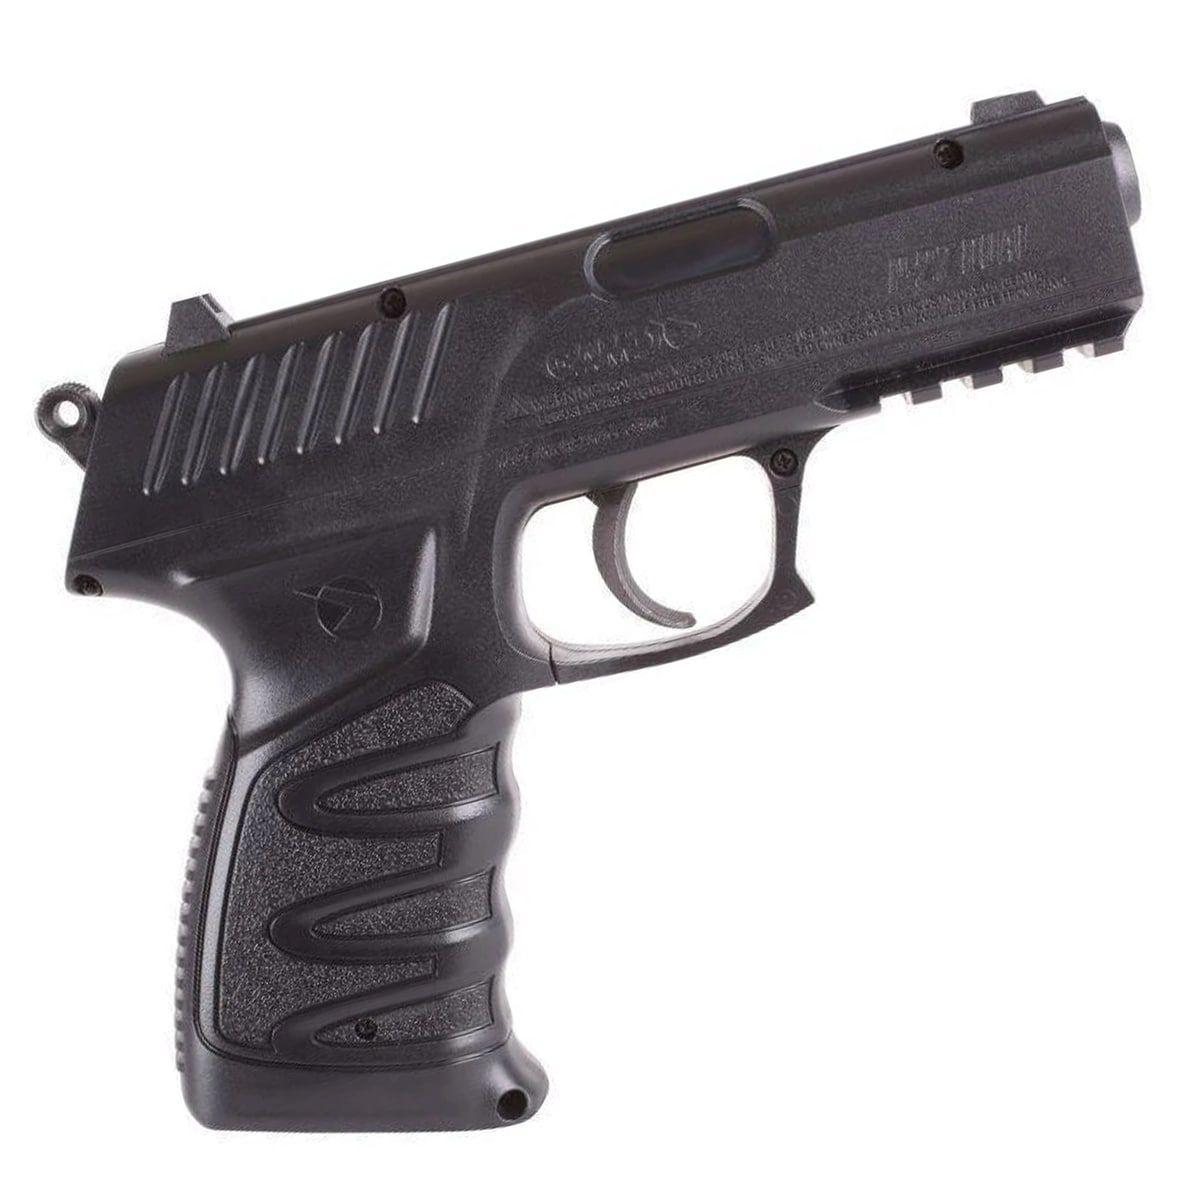 Pistola Pressão CO2 Gamo P-27 Esfera Aço E Chumbinho 4.5mm